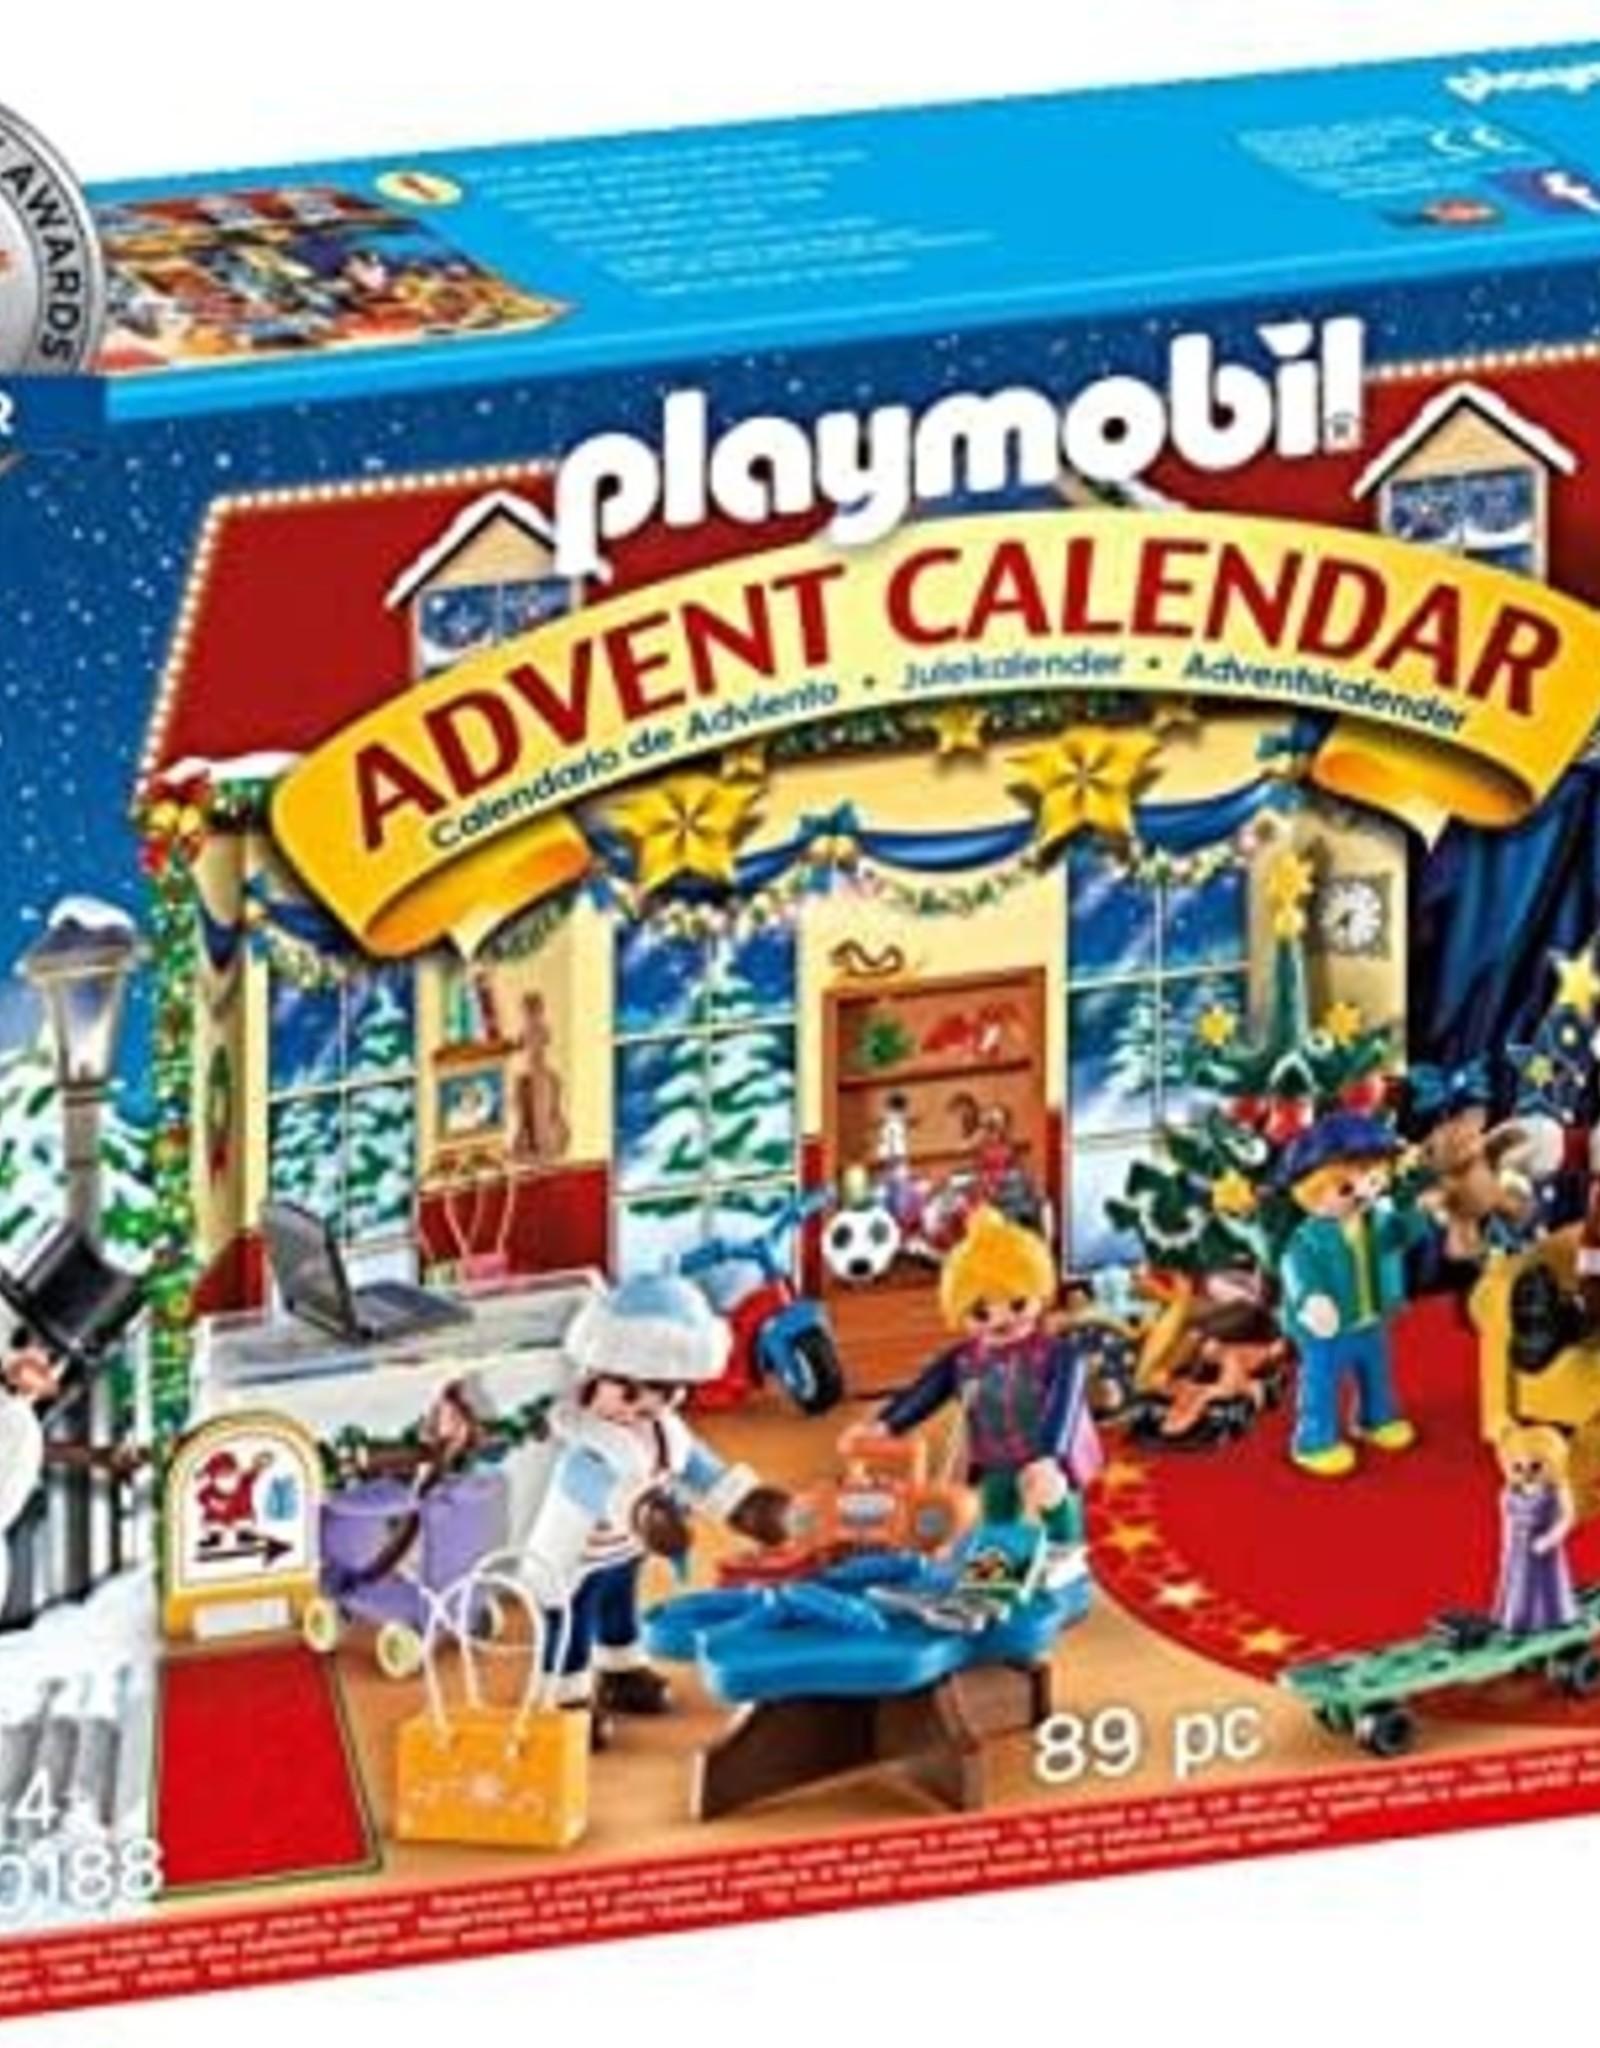 Playmobil Advent Calendar - Christmas Toy Store